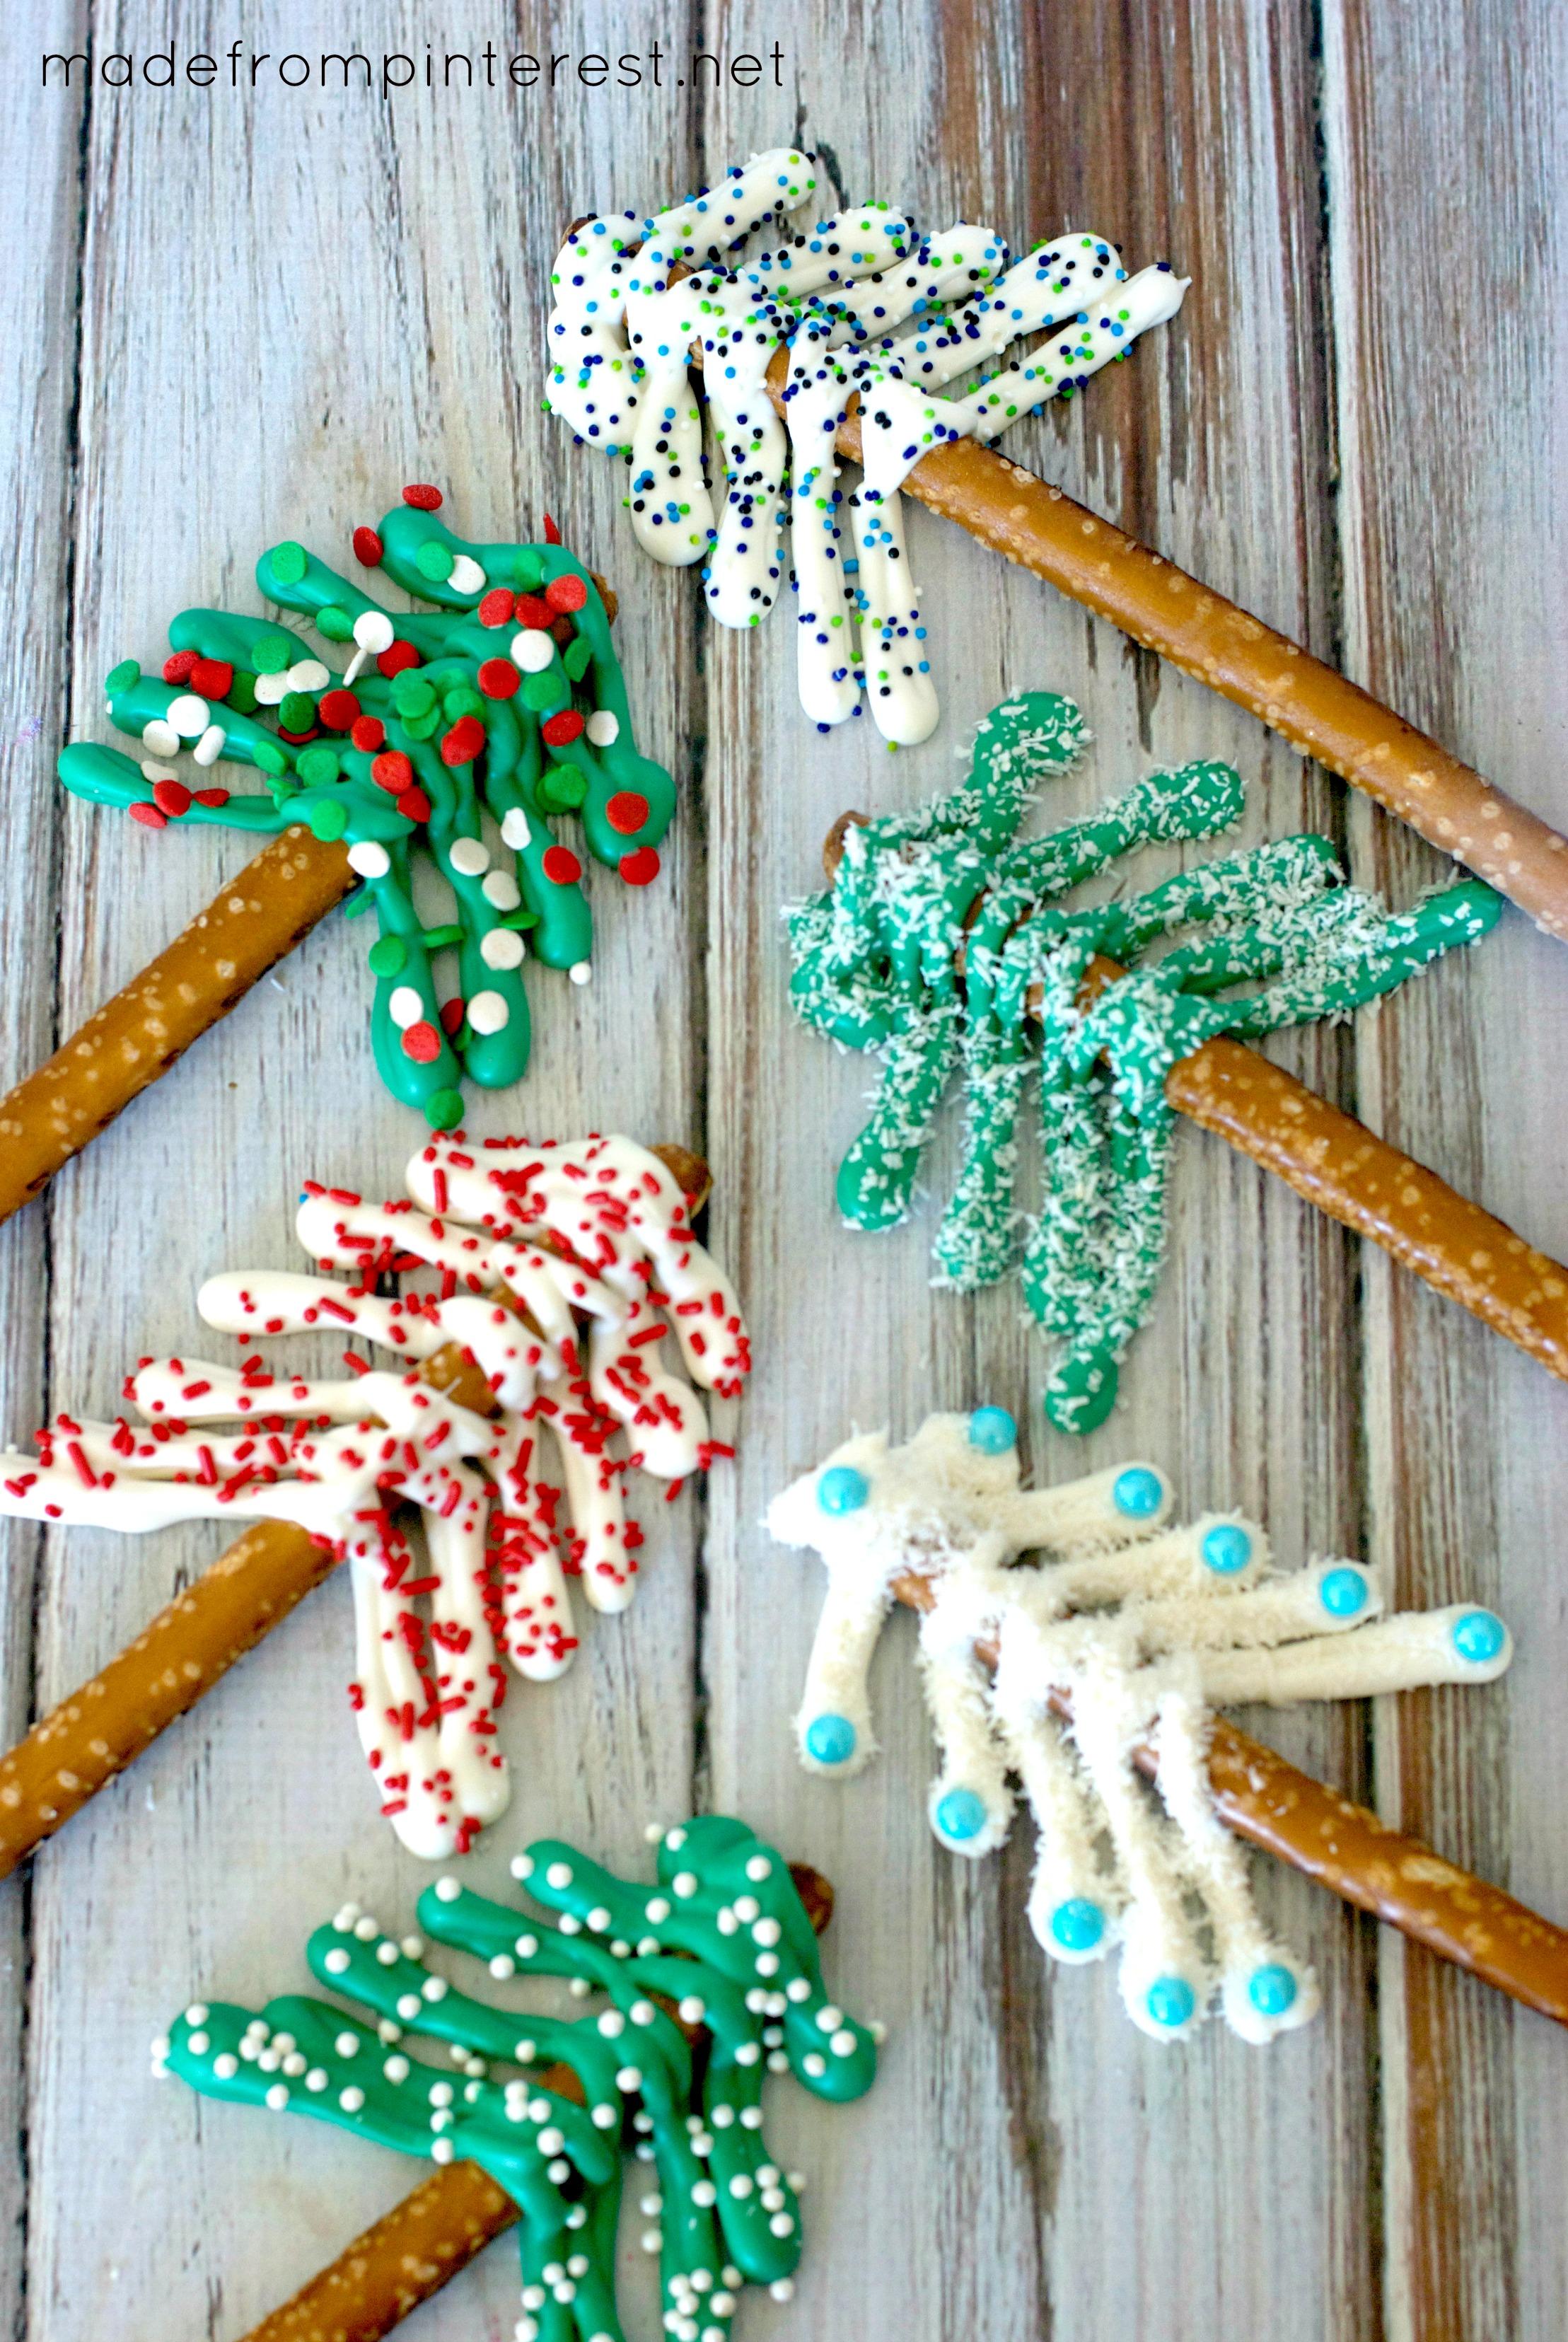 Christmas Crafts Made With Cinnamon Sticks